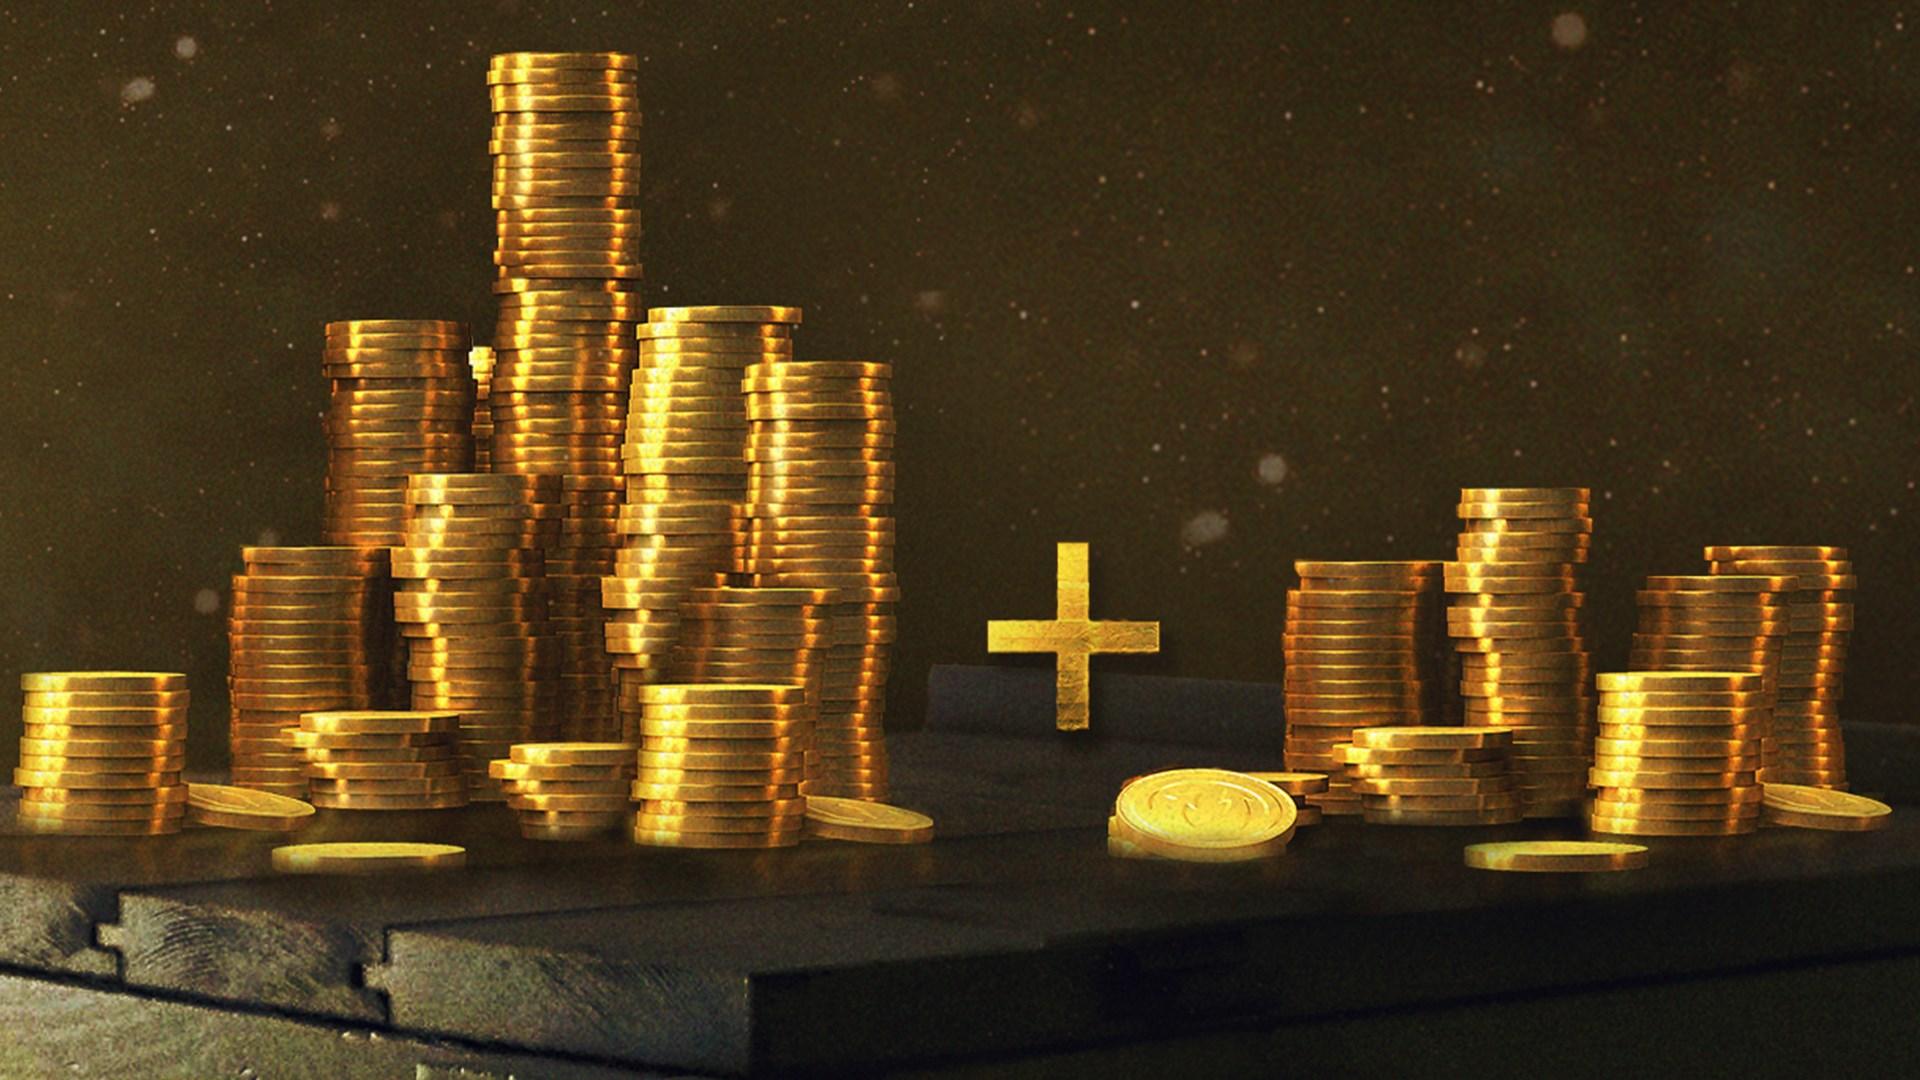 6,500 Gold